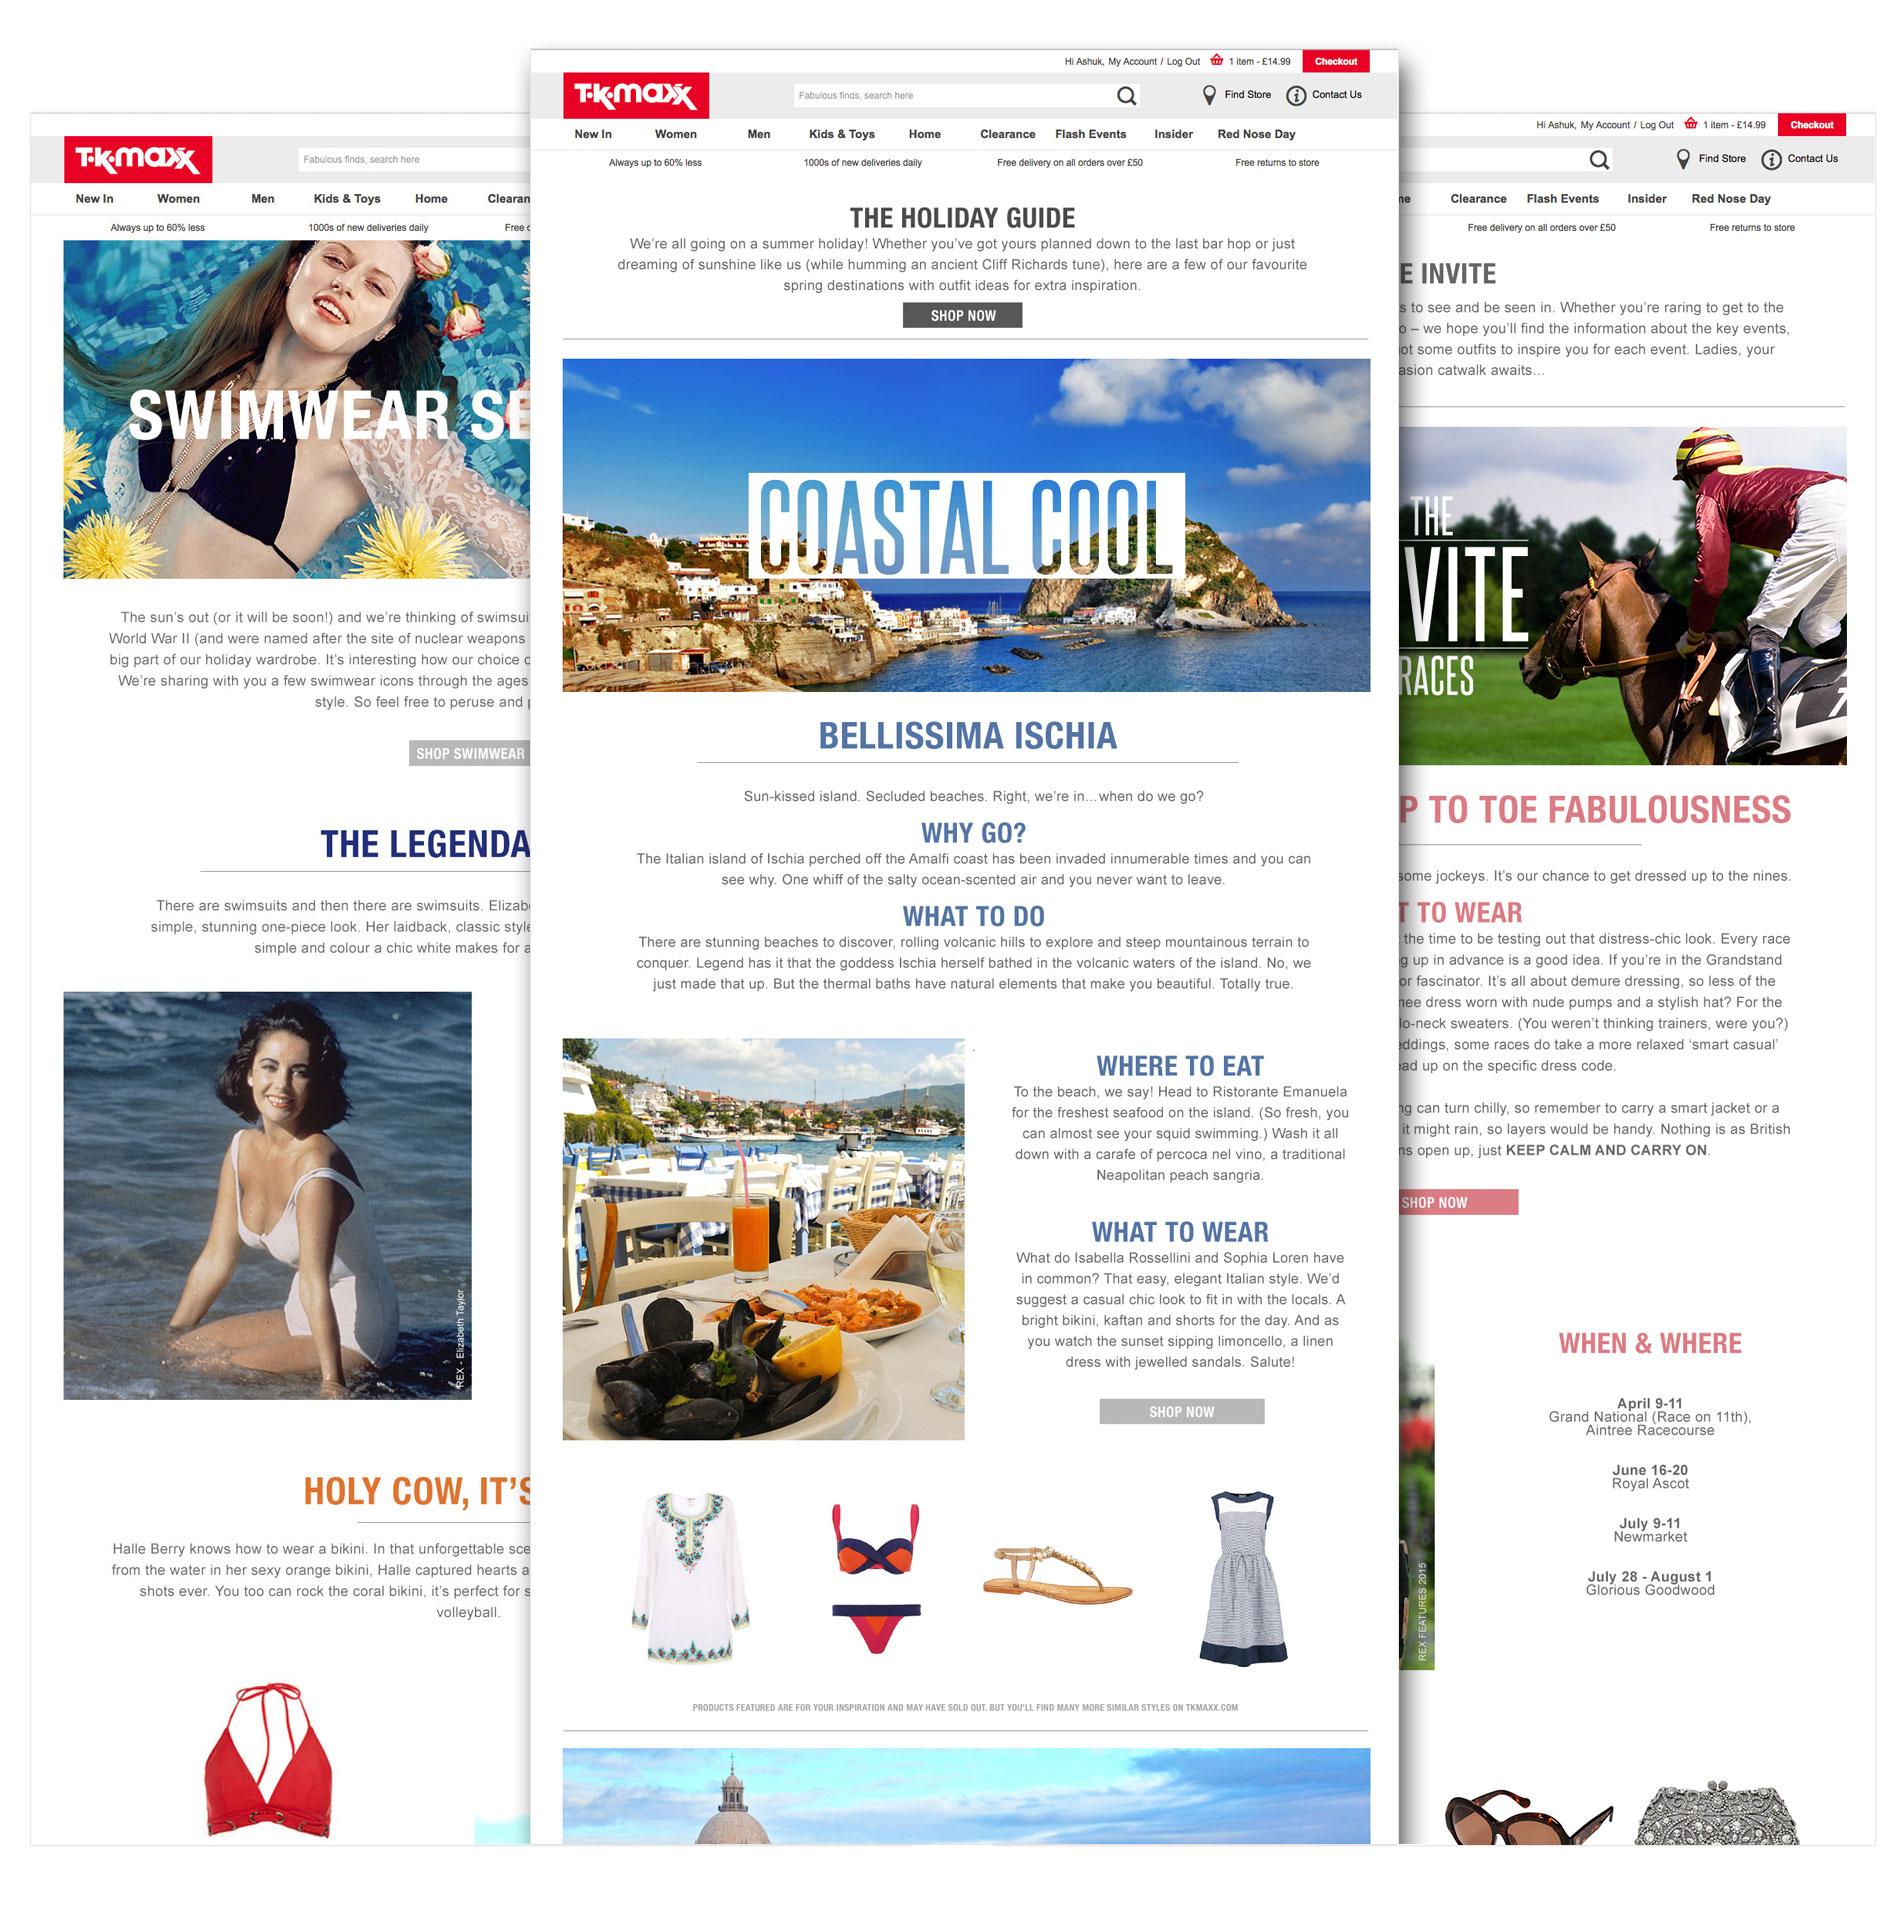 TK Maxx Website Design | Ashuk Ali